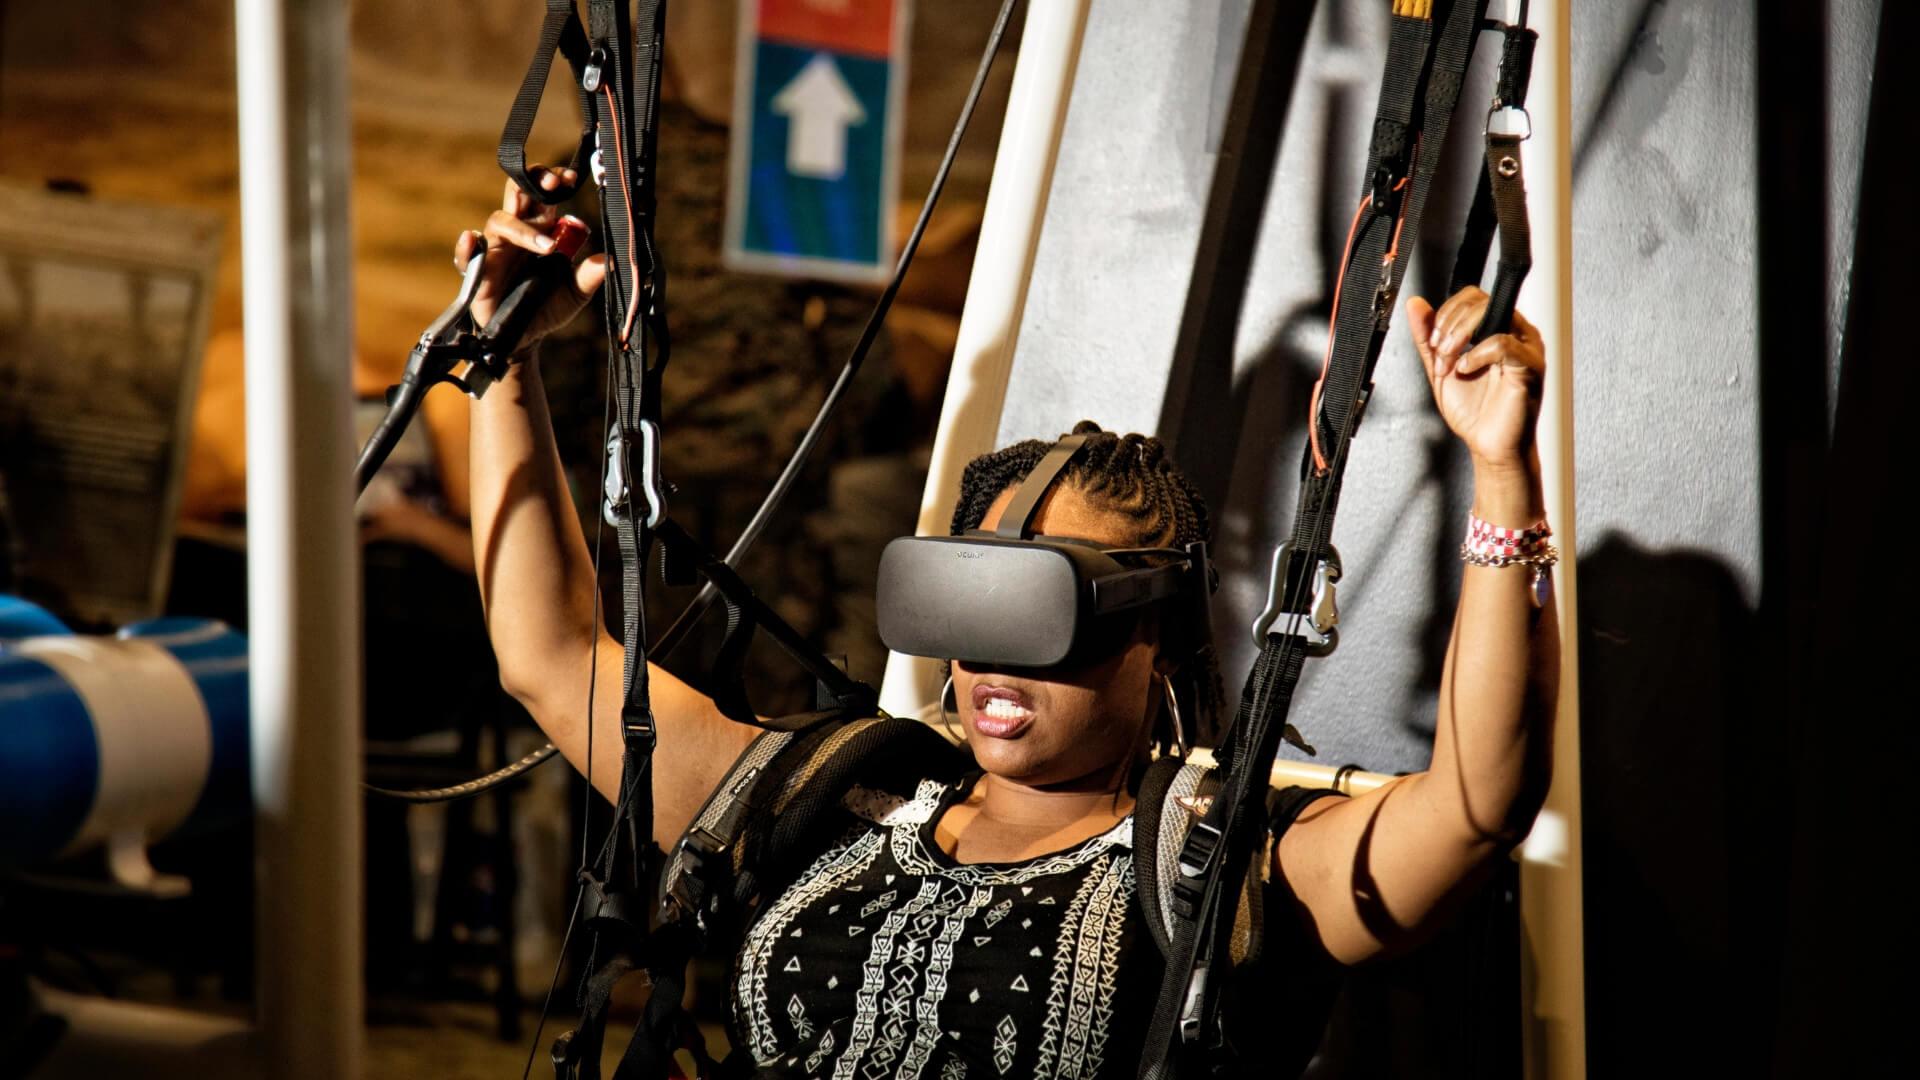 Person uses virtual reality parachute